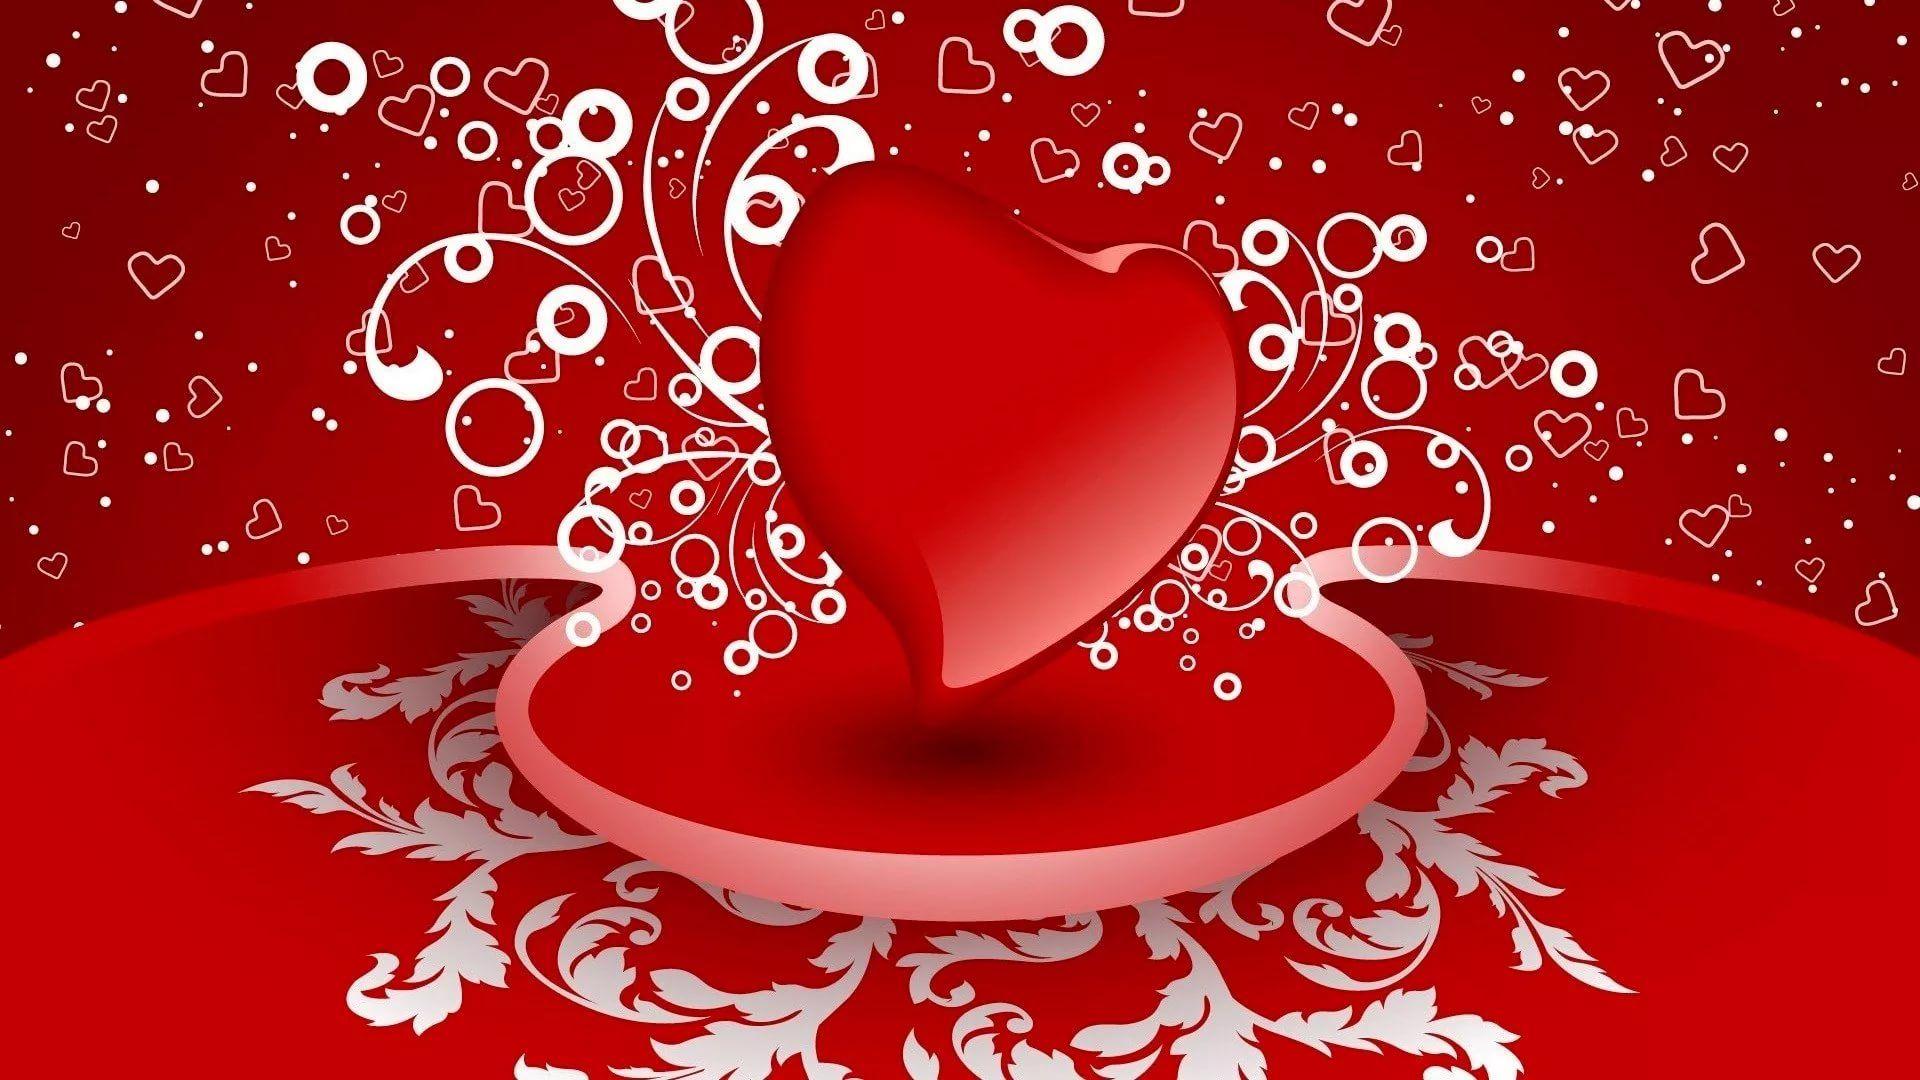 Valentine Screensaver PC Wallpaper HD